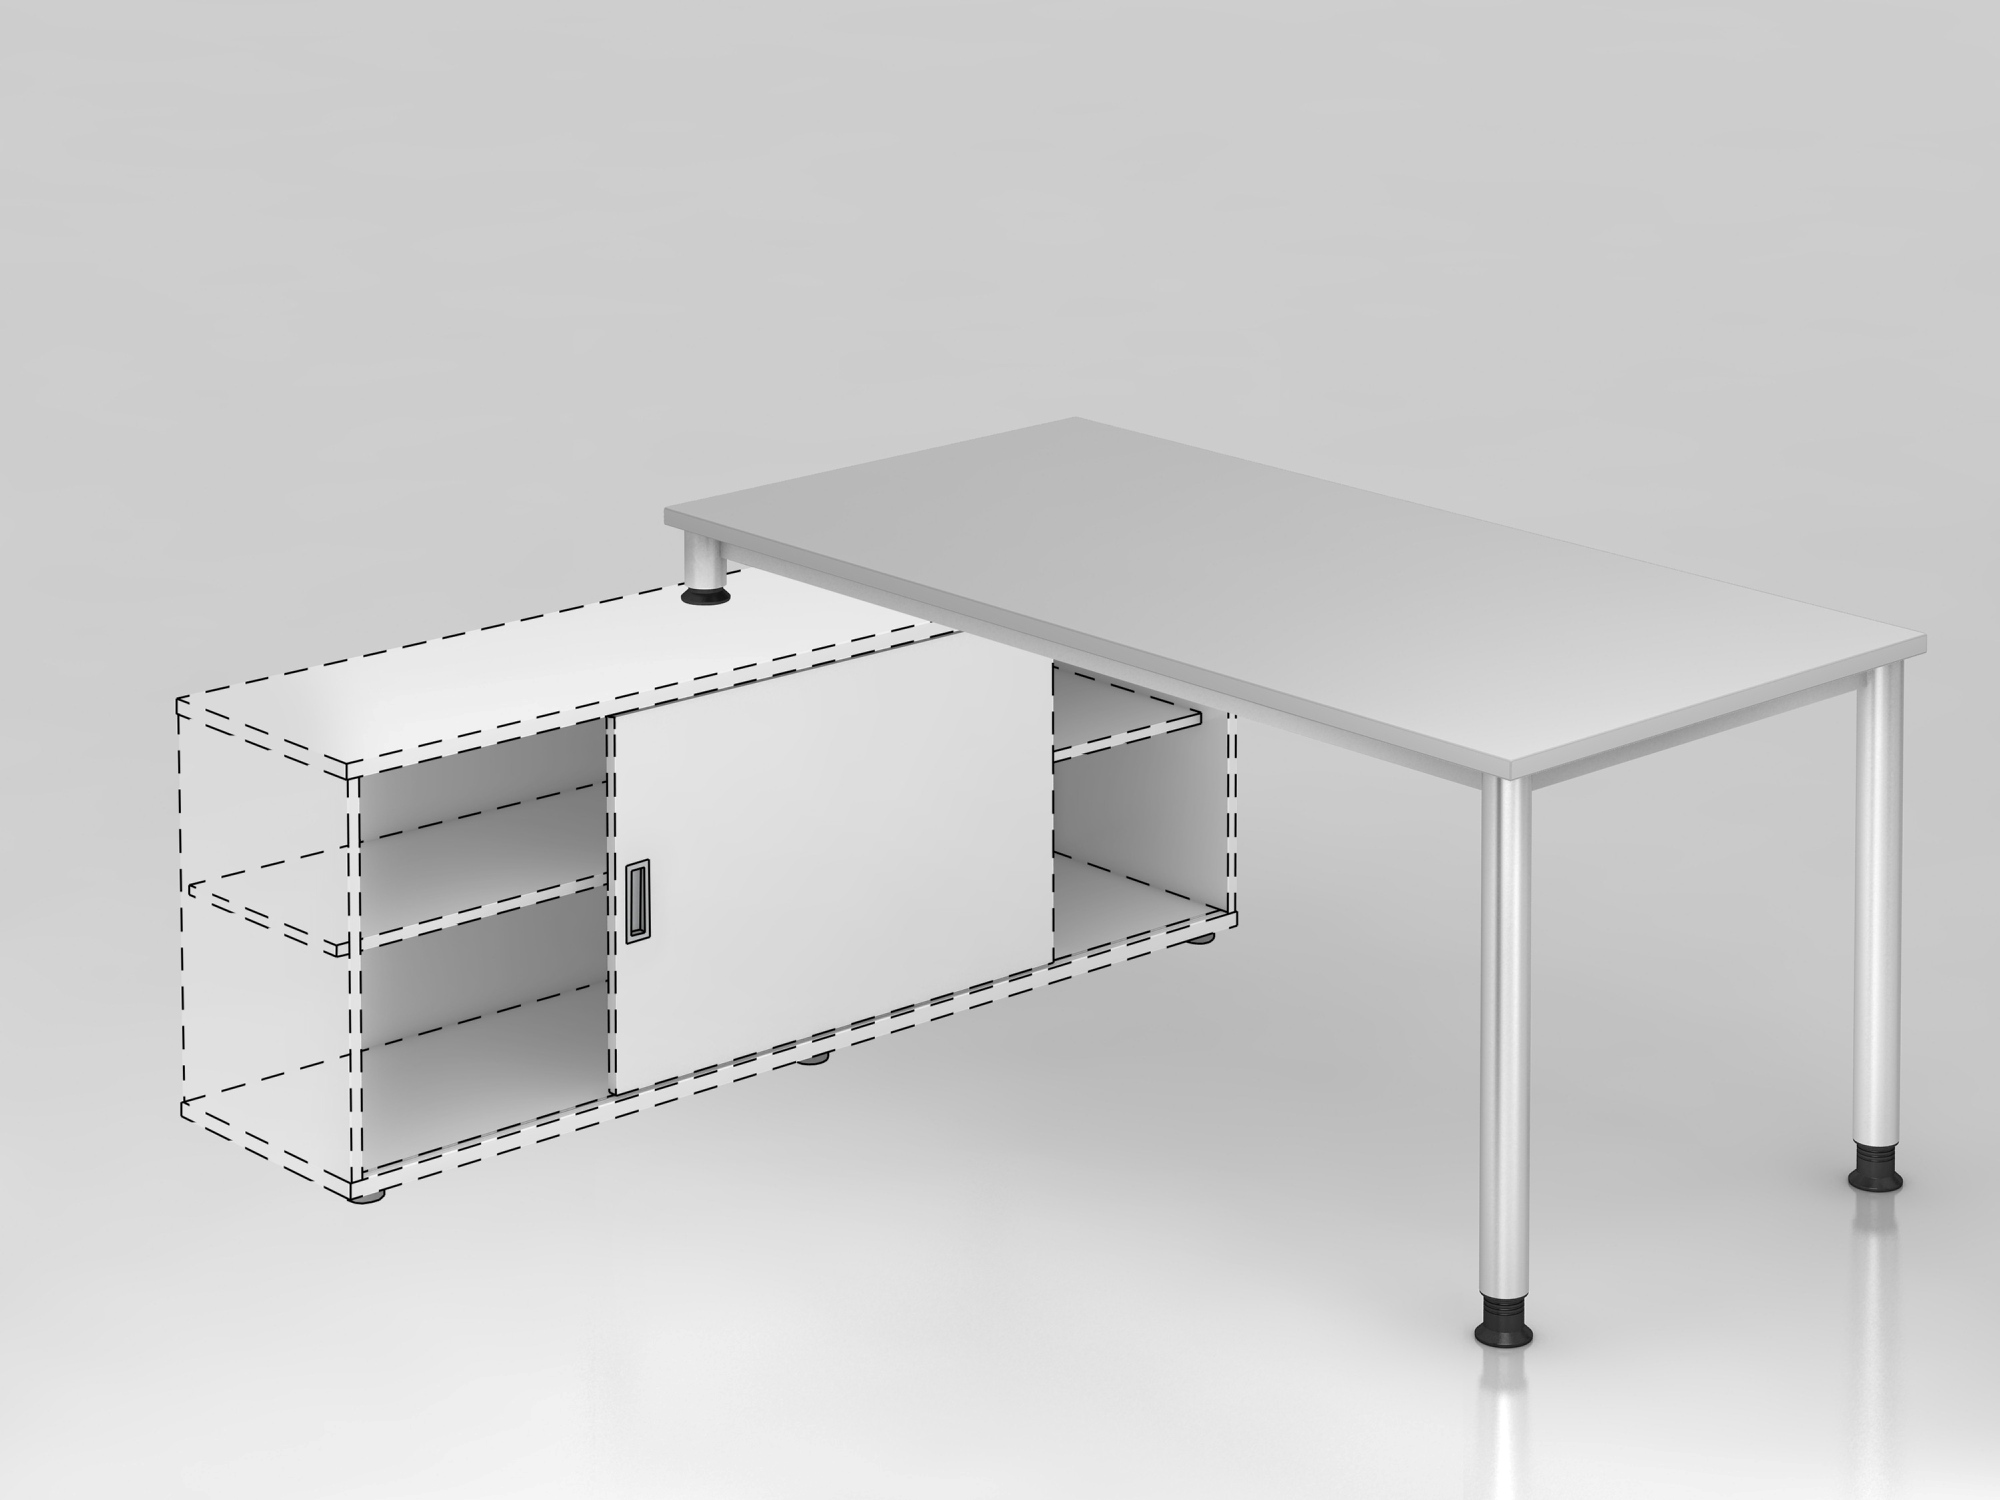 Anbauschreibtisch 4Fuß-rd.160x80cm Grau/Silb